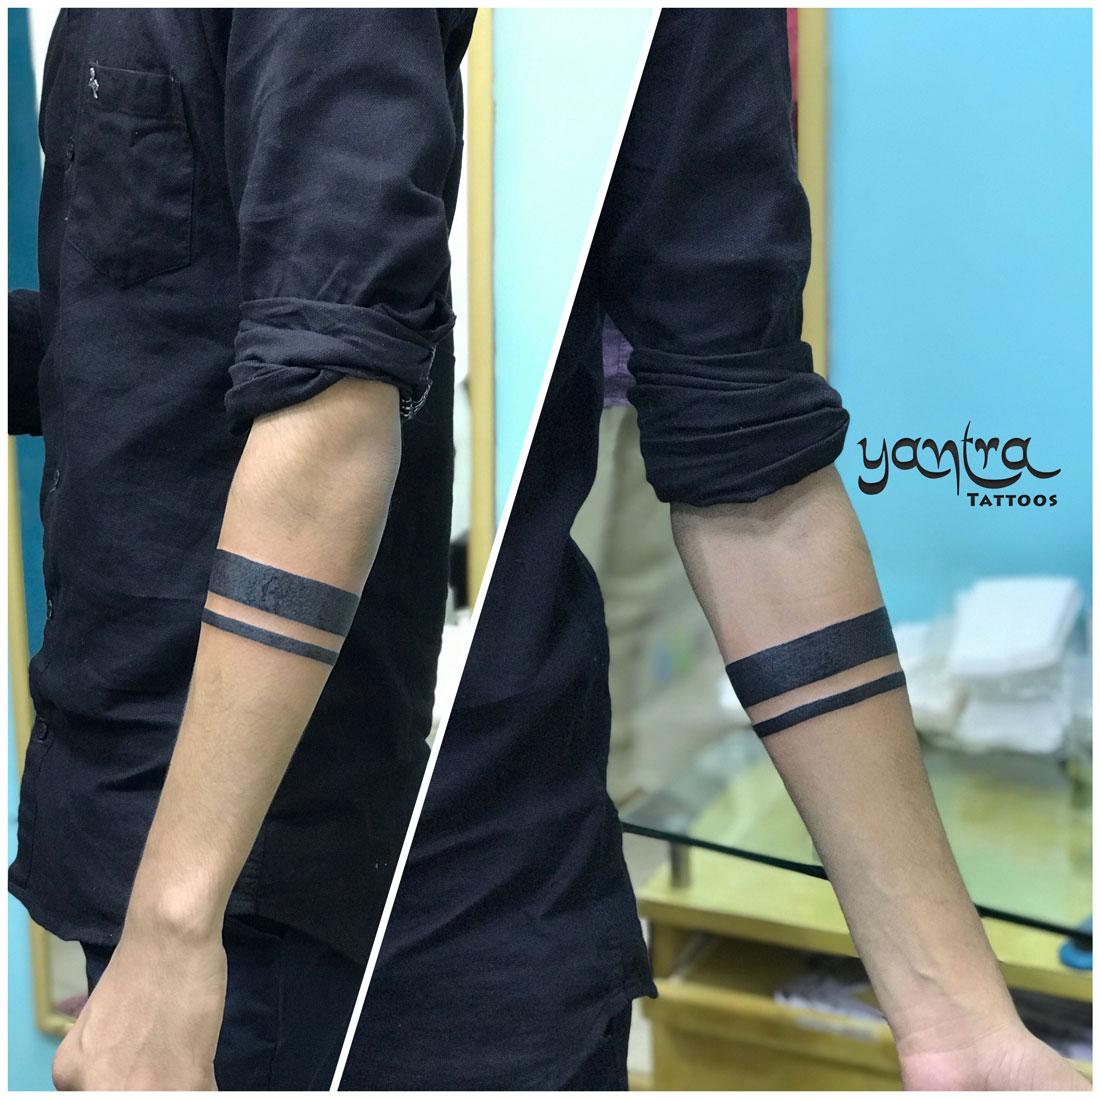 black band tattoo yantra tattoos chennai